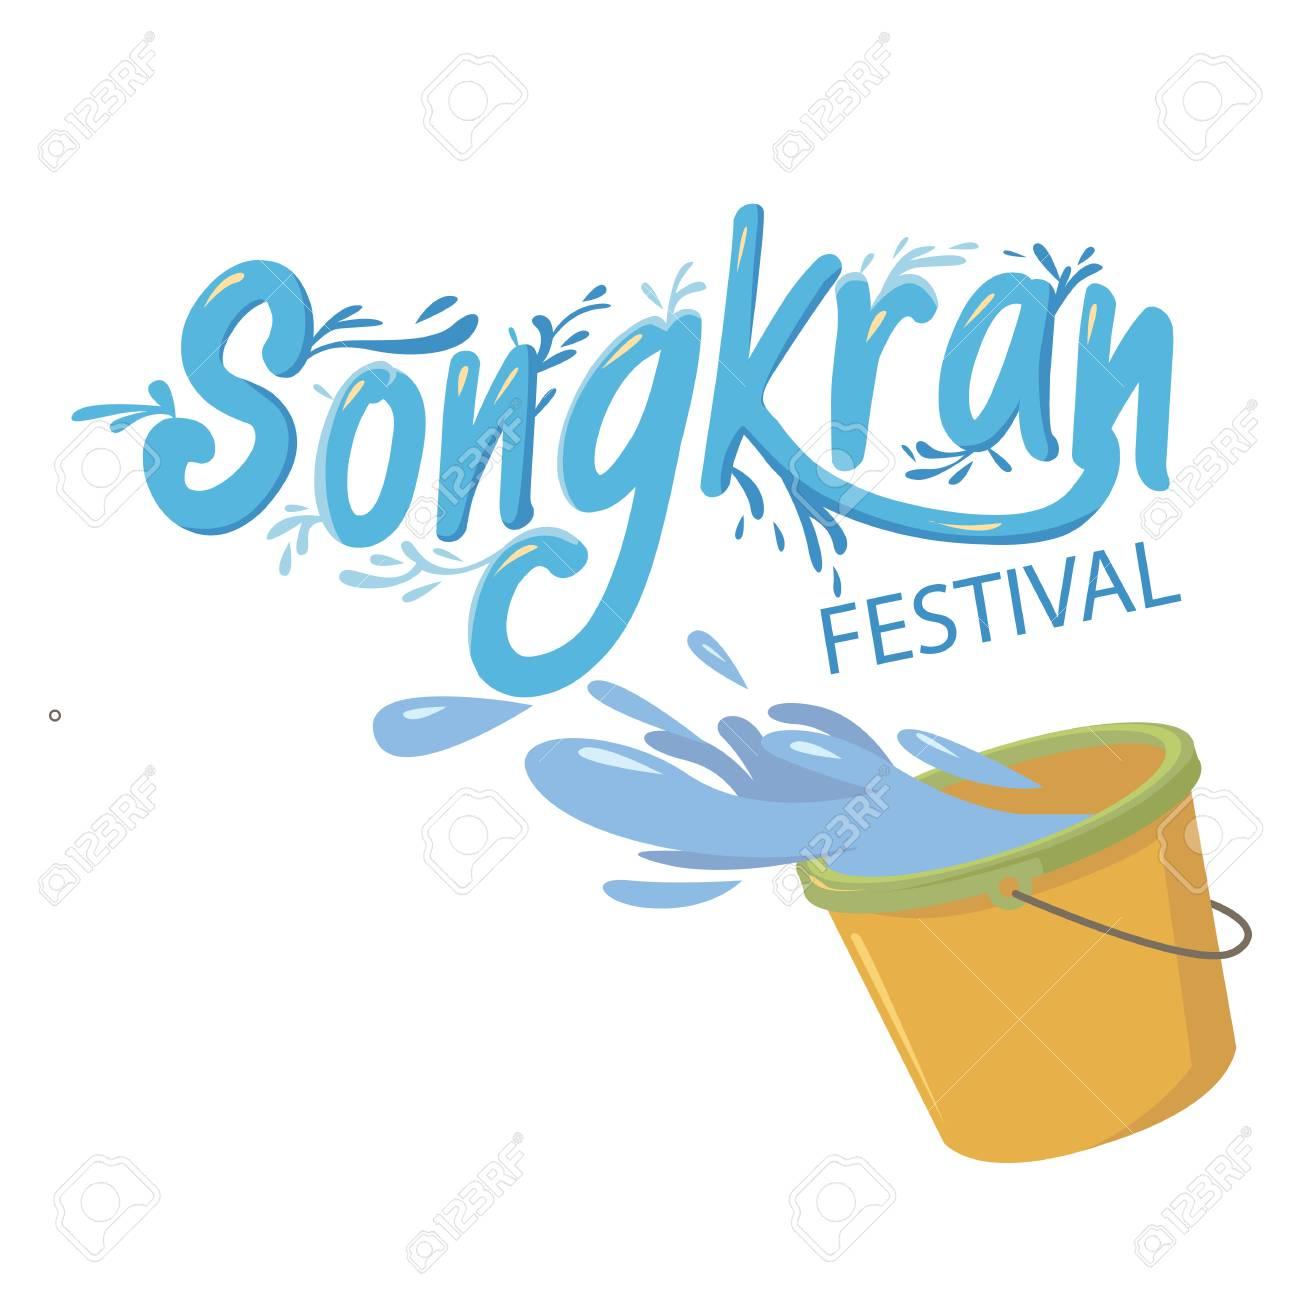 Songkran Festival Greeting Card Template Design Royalty Free ...